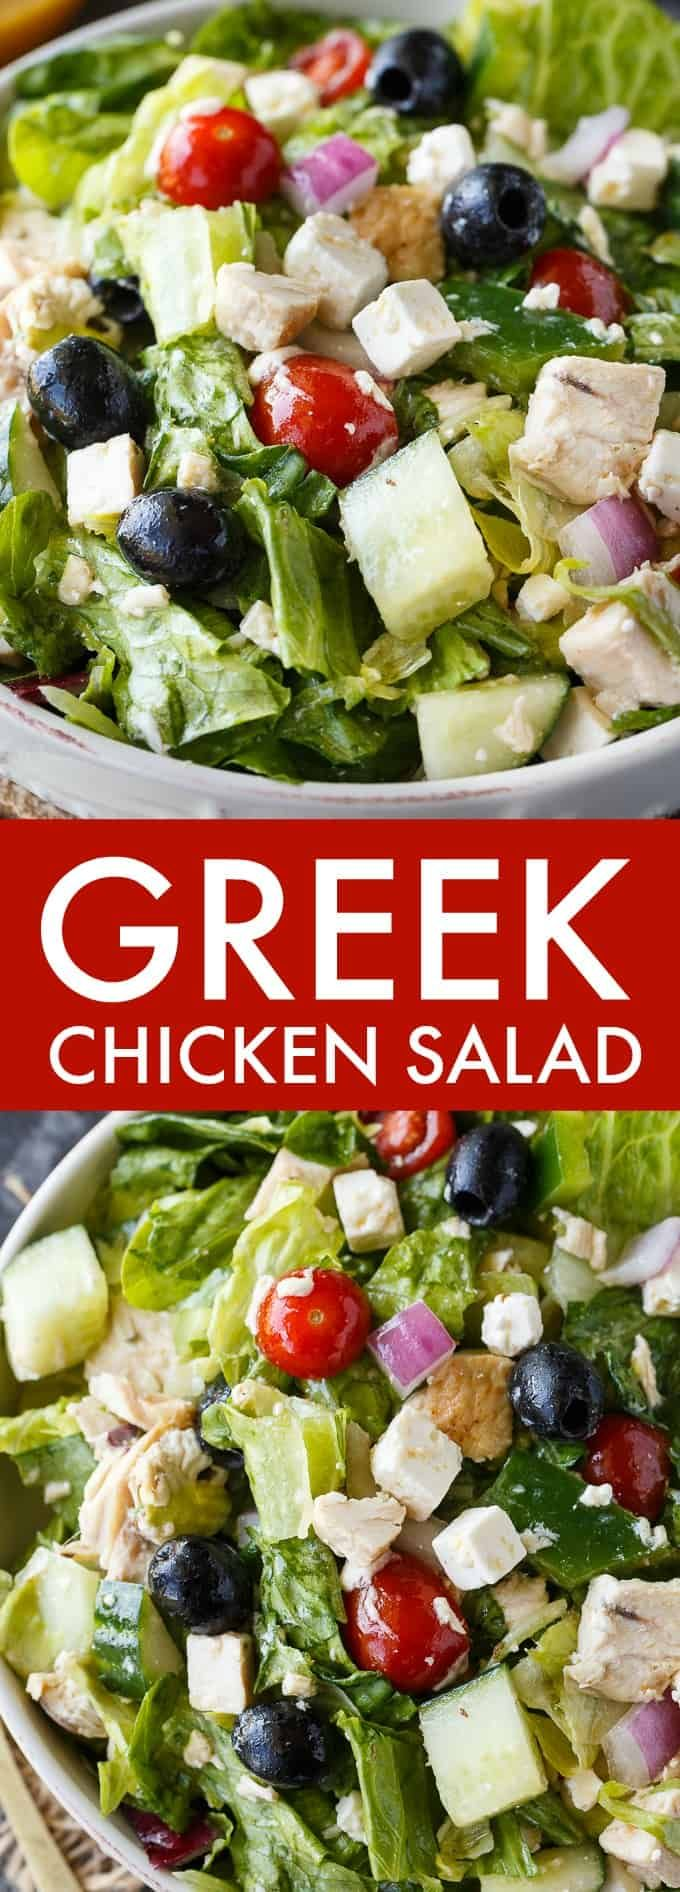 Greek Chicken Salad Recipe Greek Chicken Salad Greek Chicken Pot Recipes Healthy